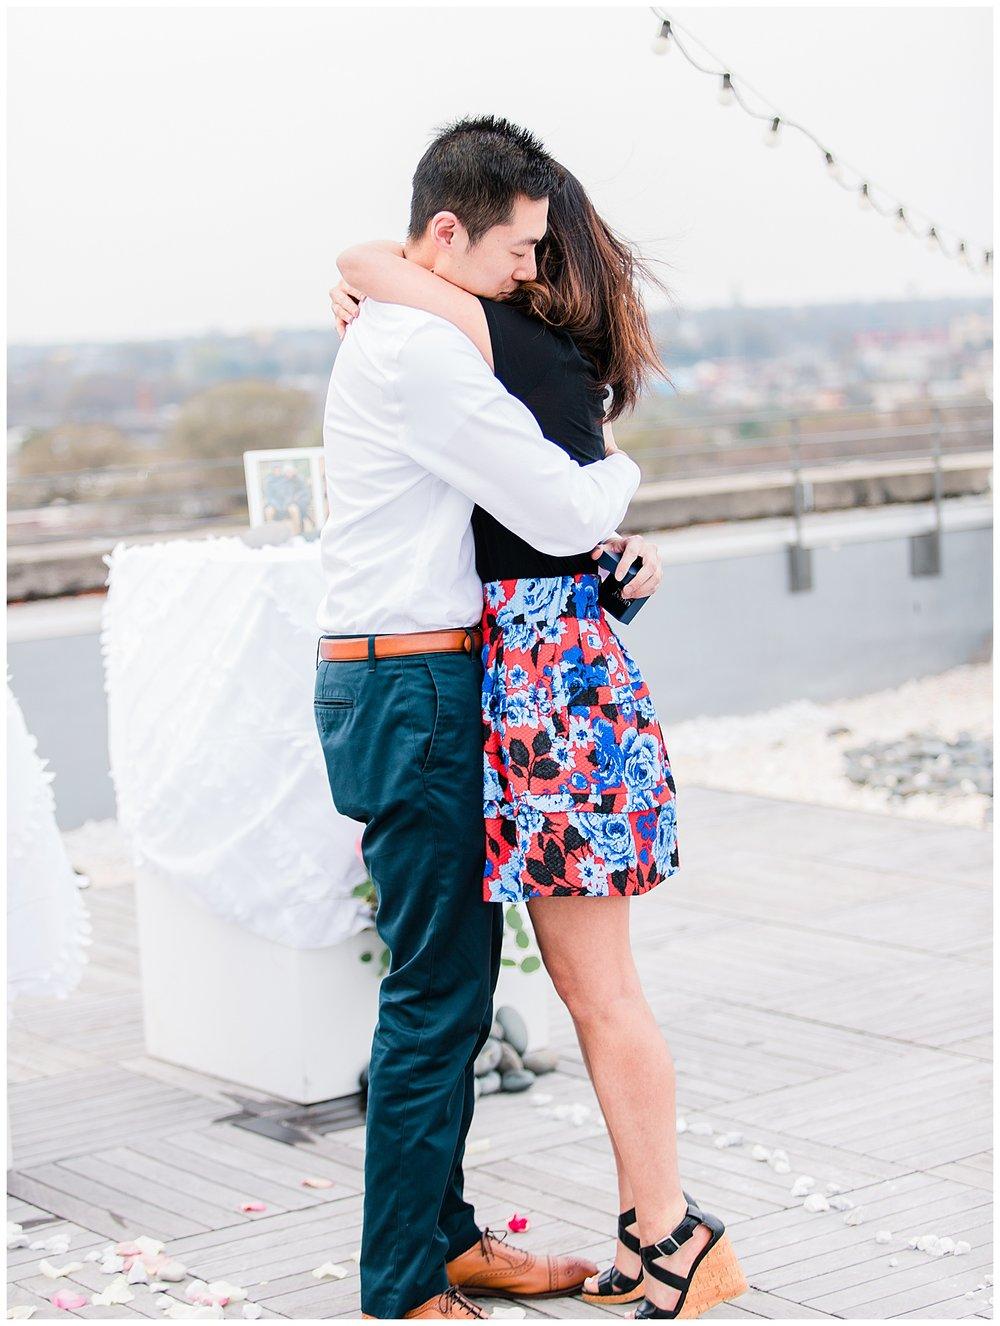 Quirk Hotel engagement session - Virginia Wedding Photographer